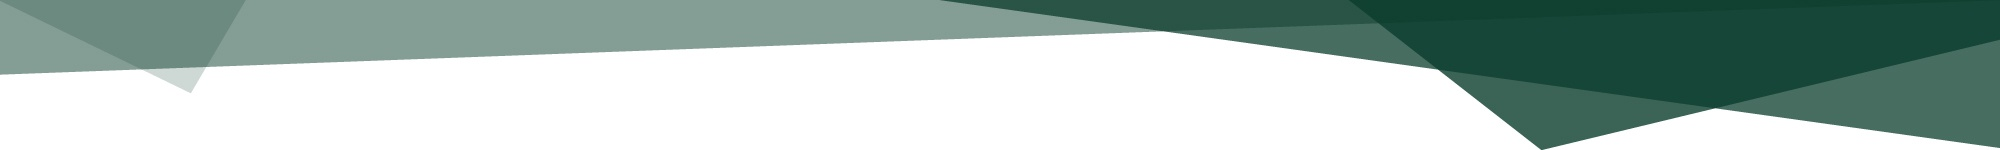 caratteristiche coperture pvc usate